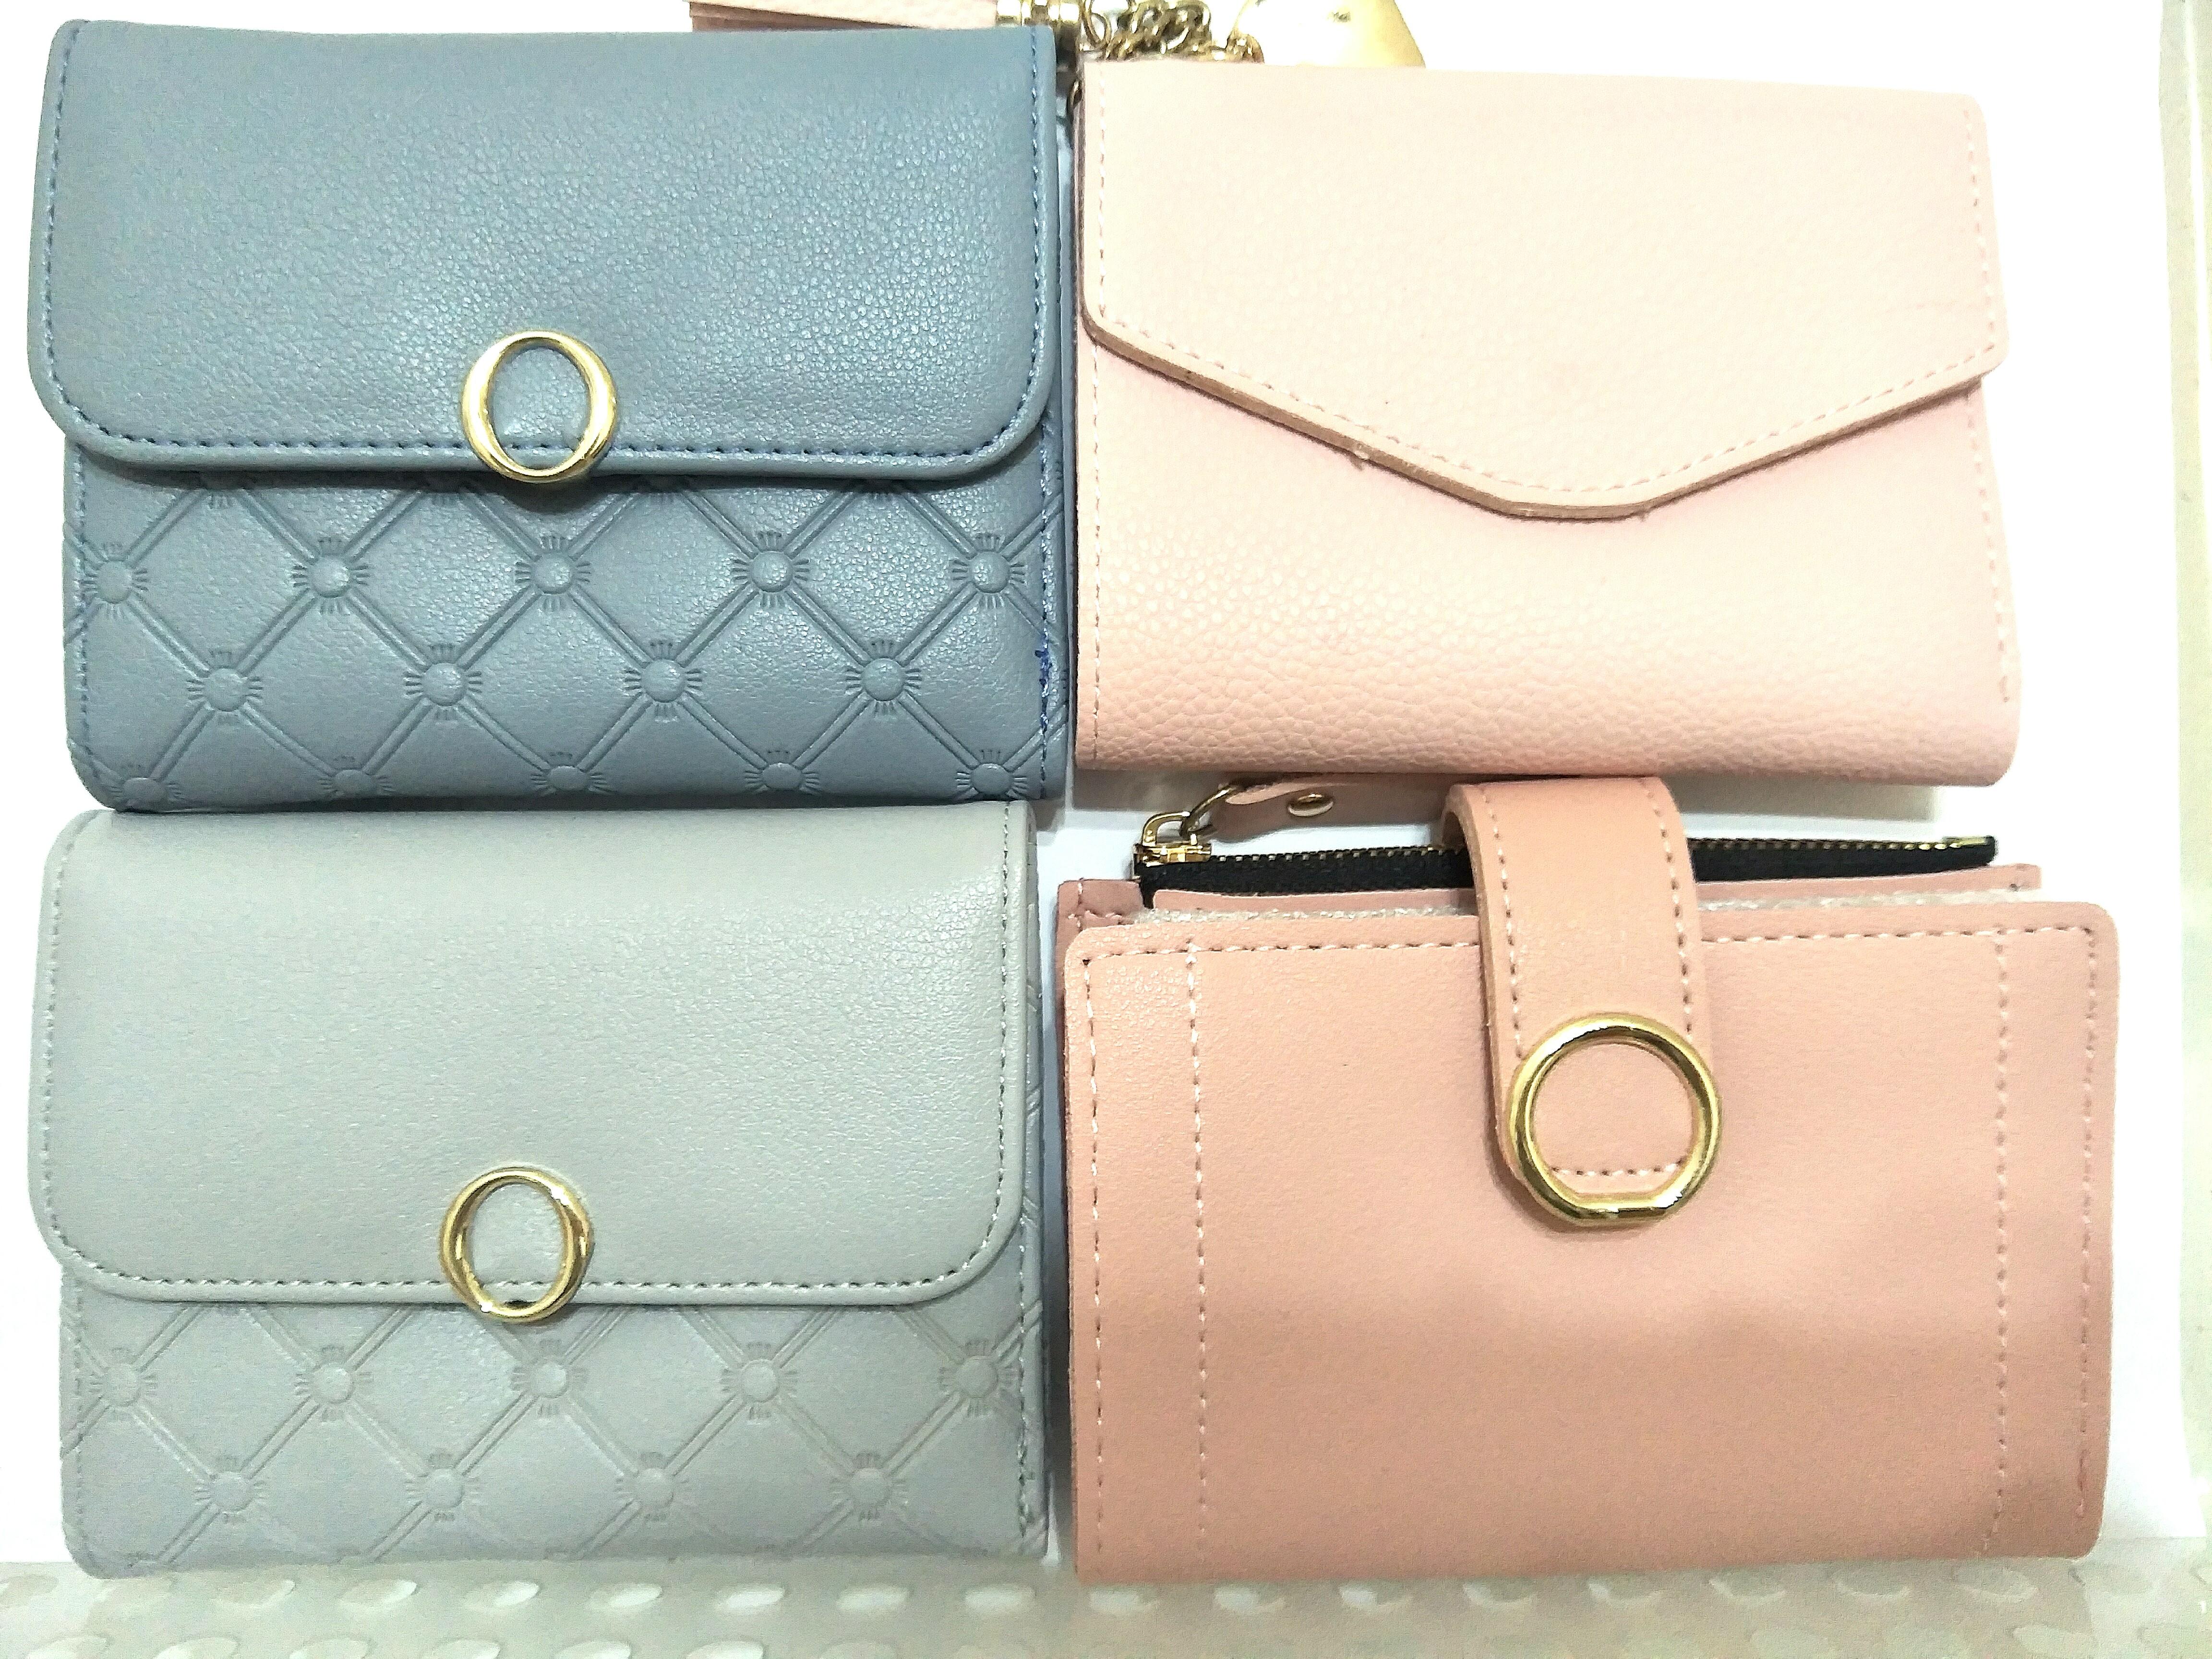 Designer Handbag Clearance Sale